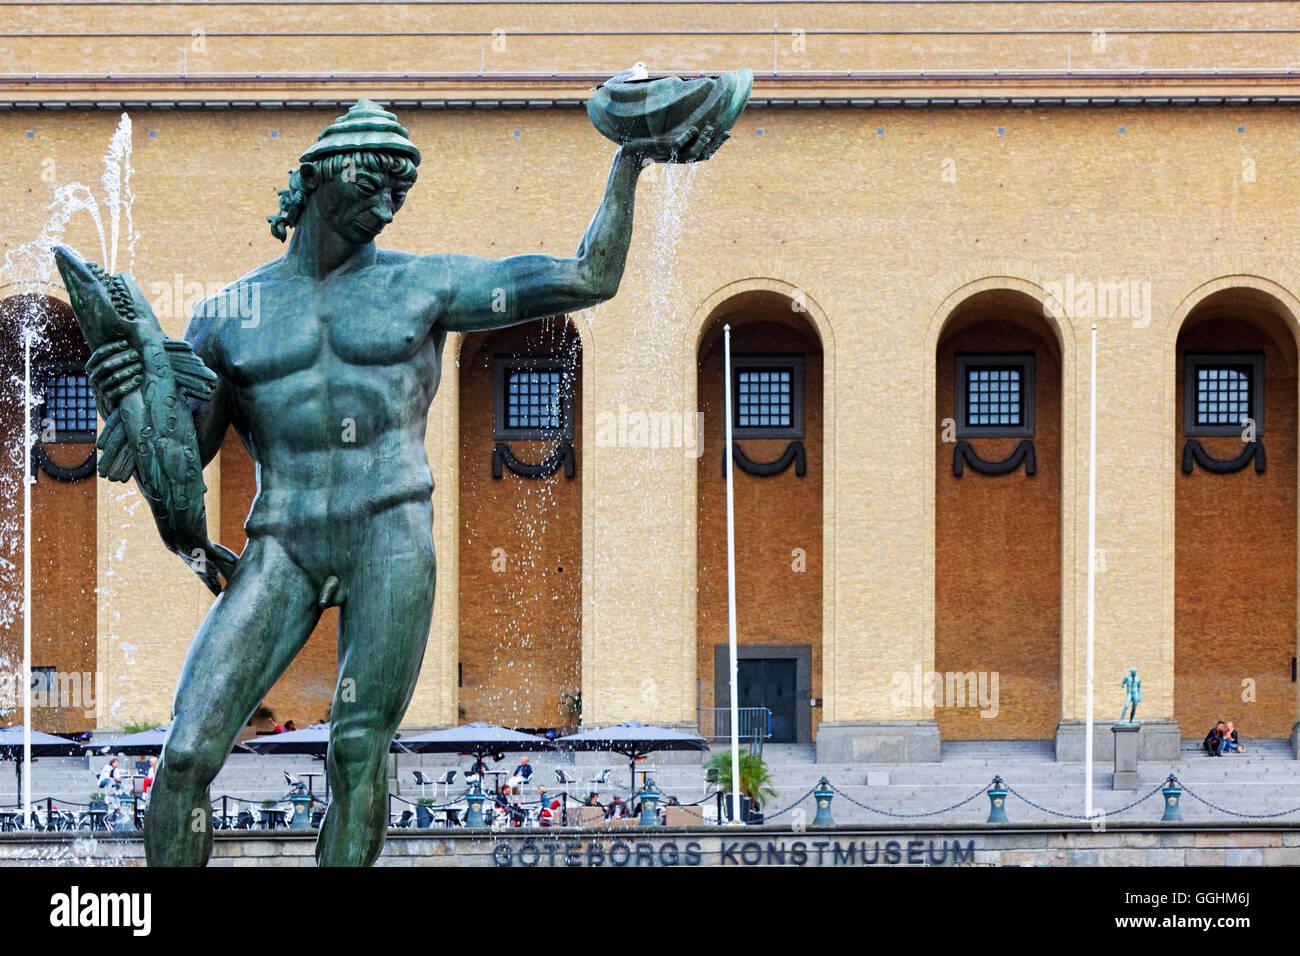 Poseidon Statue von Carl Milles infront des Museum of Art, Göteborg, Schweden Stockbild